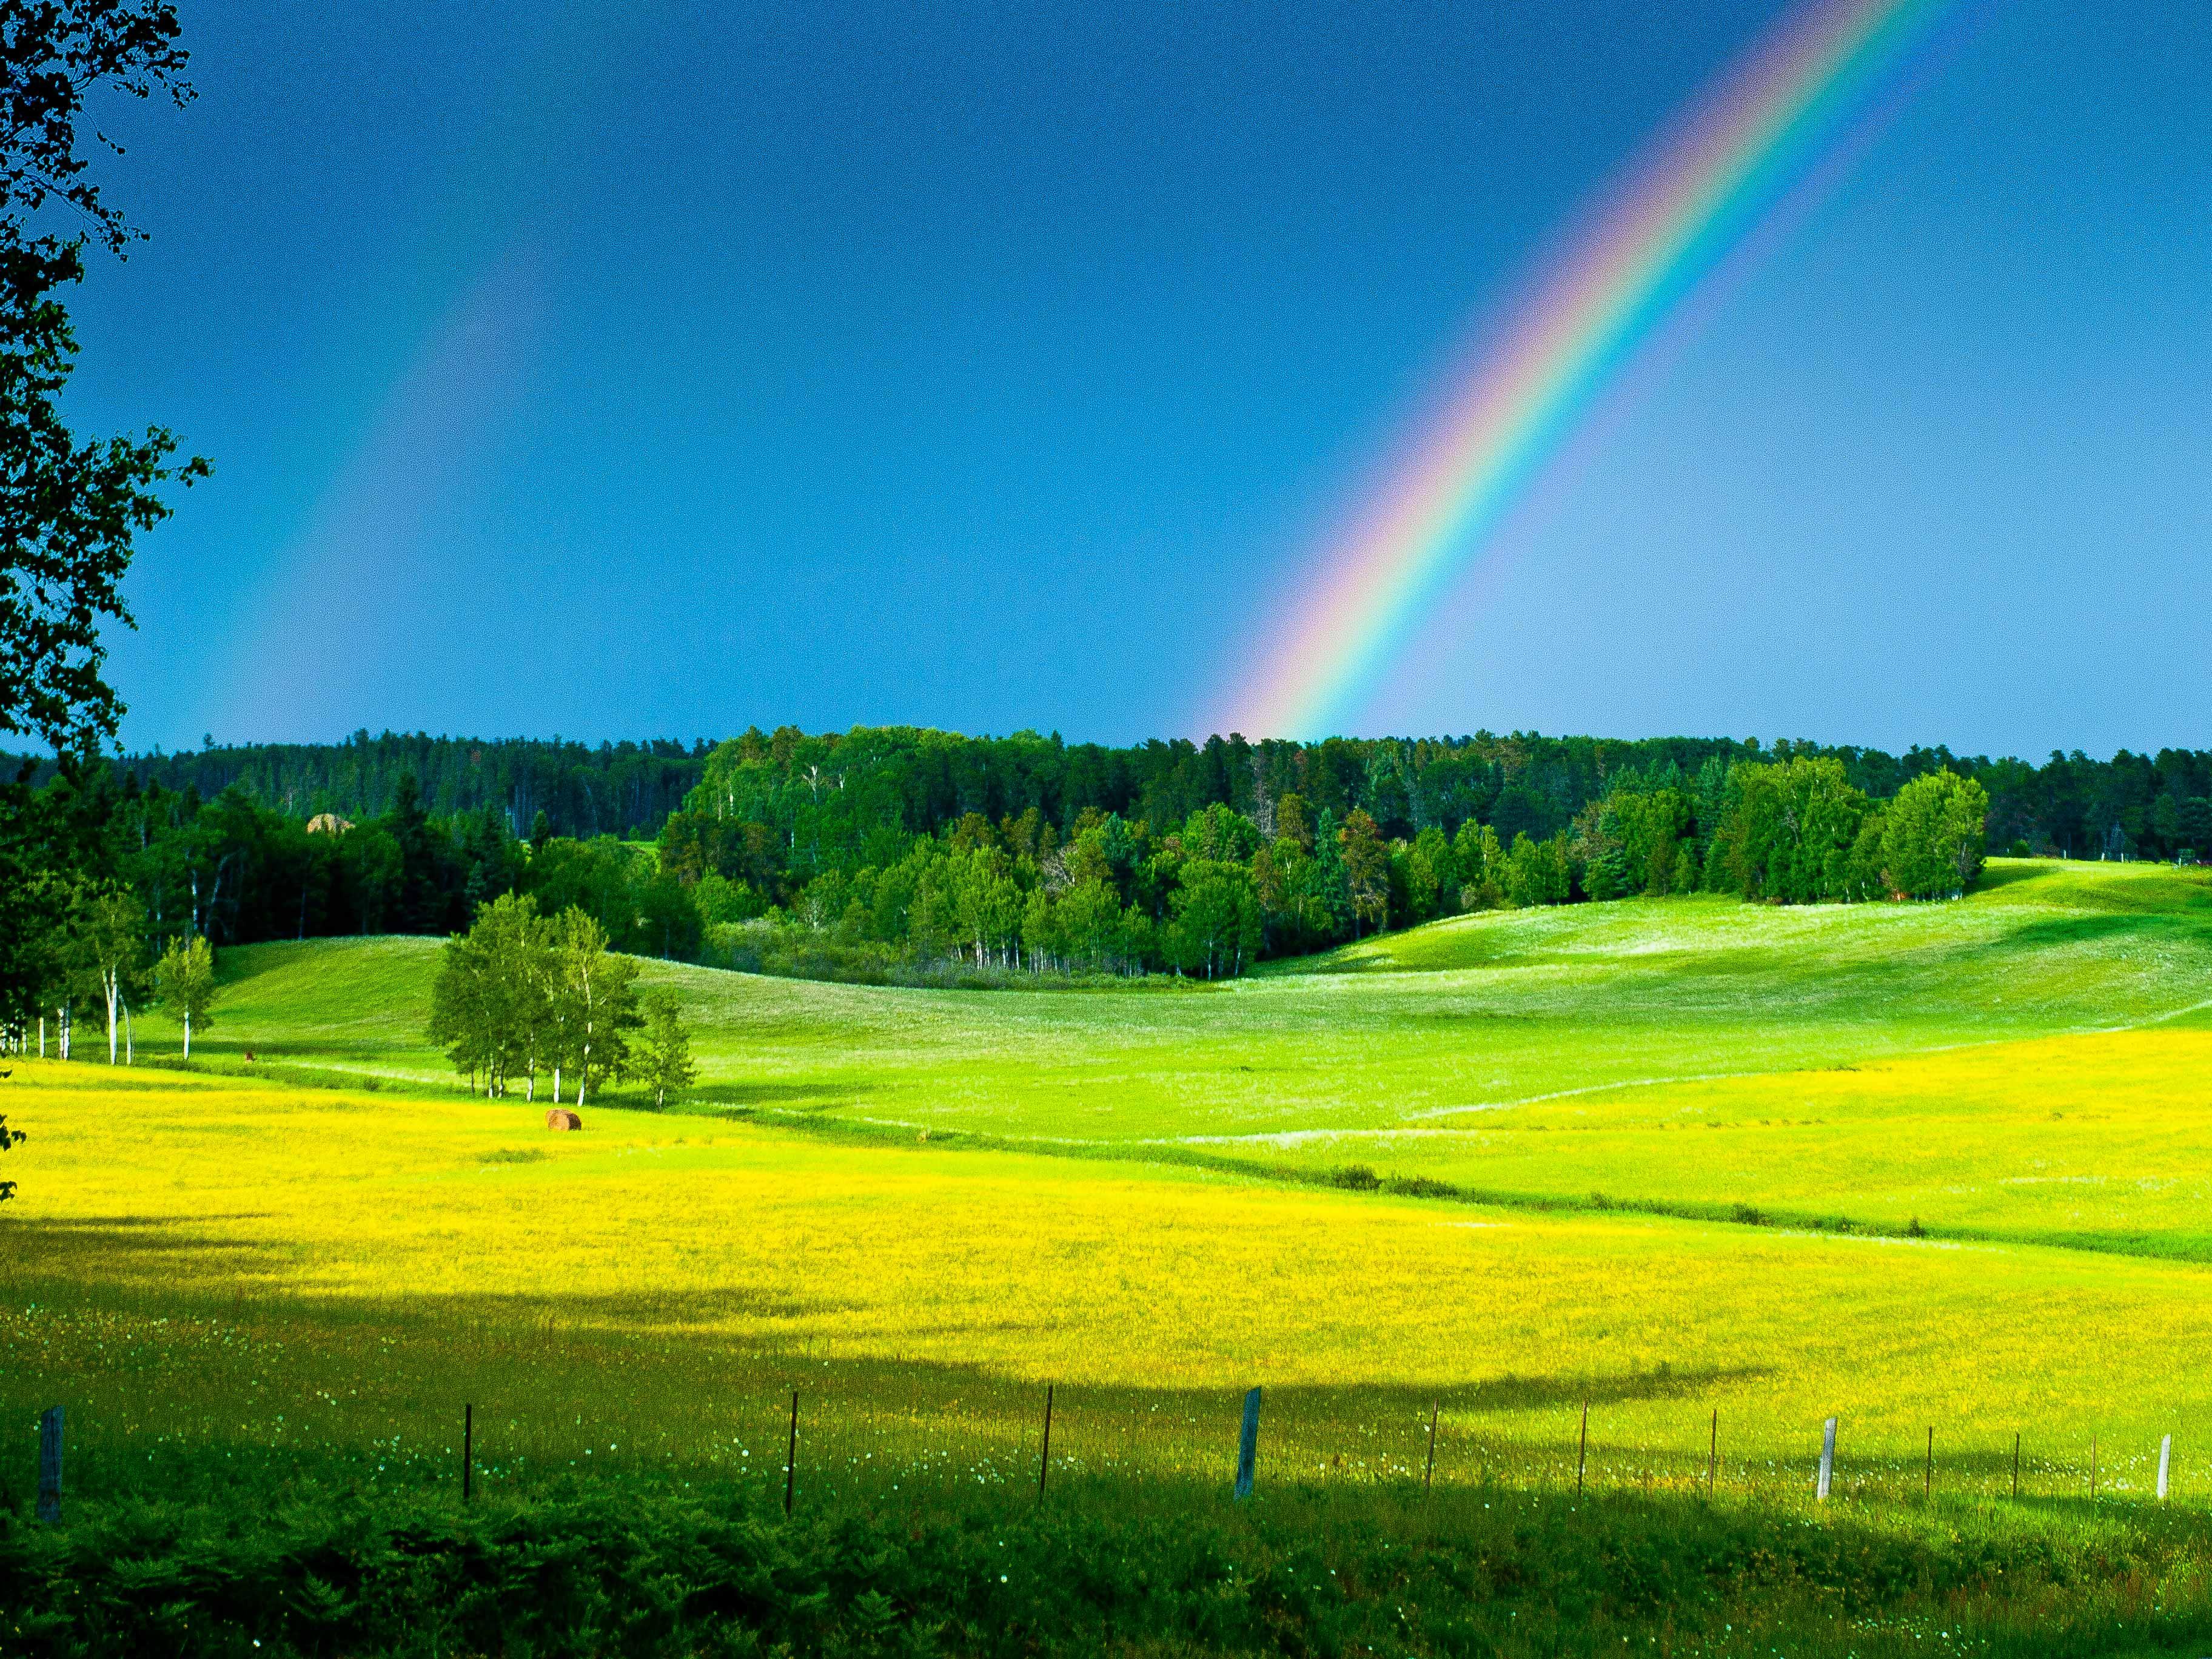 Field of rainbows